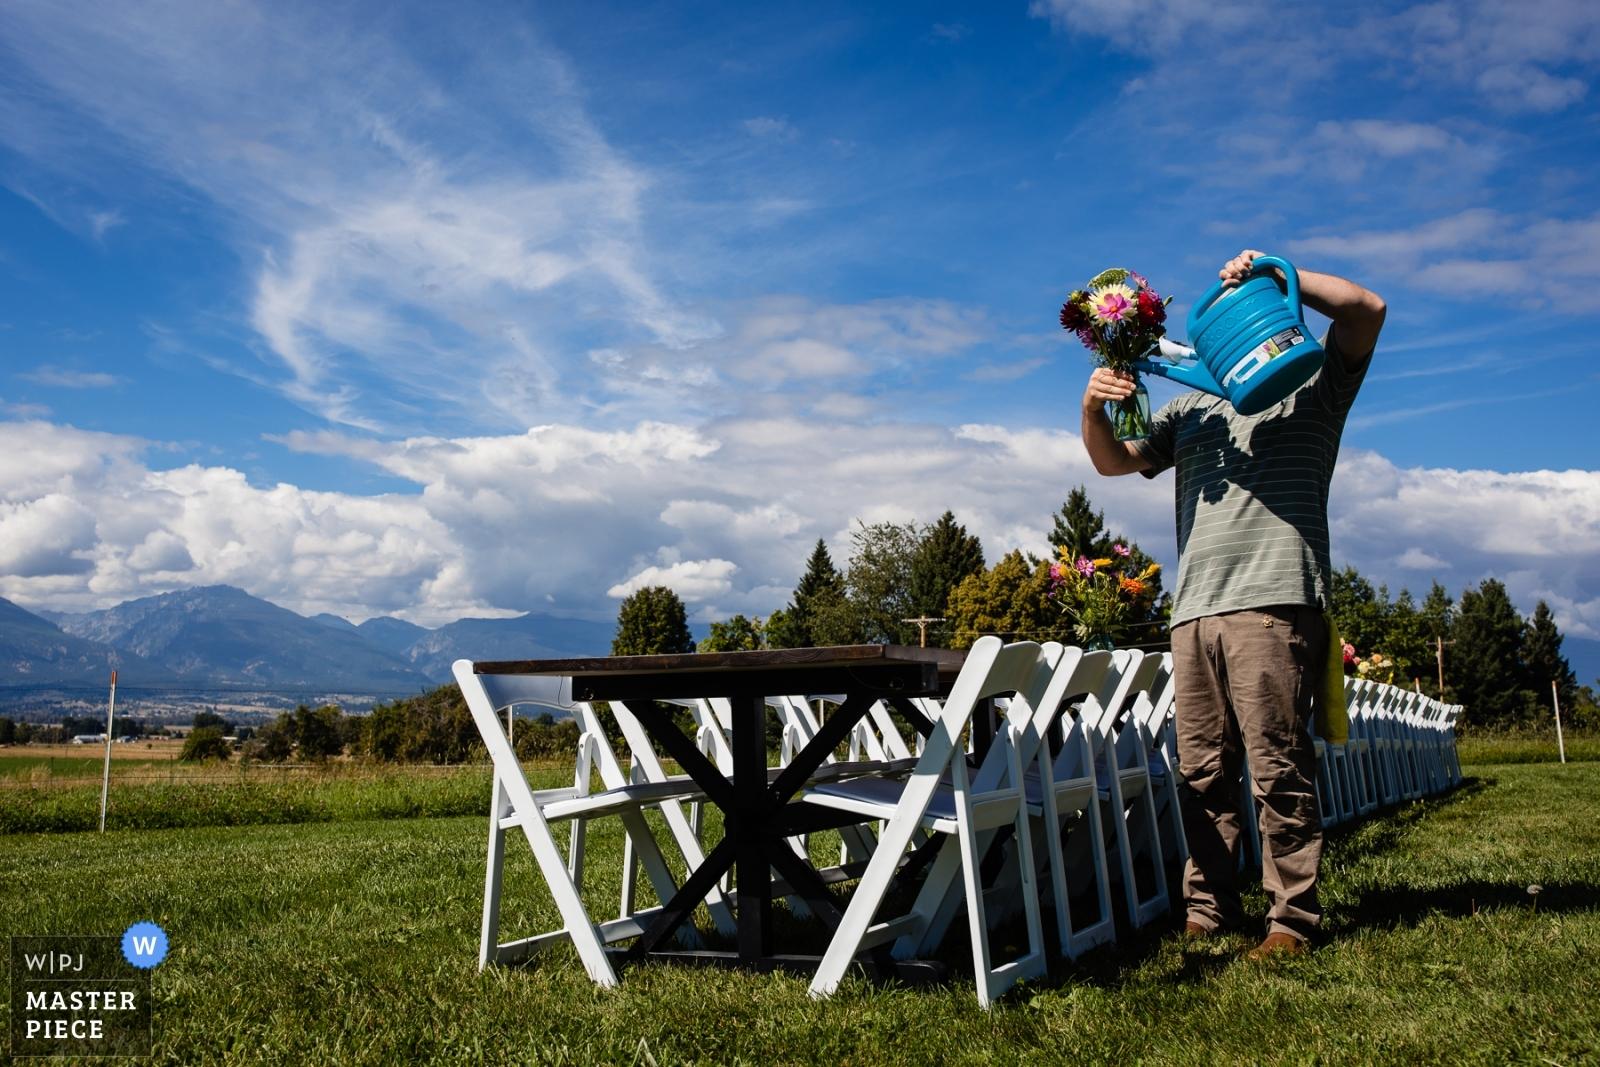 groom watering flowers - Missoula, Montana Wedding Photography -  | Corvallis, Montana